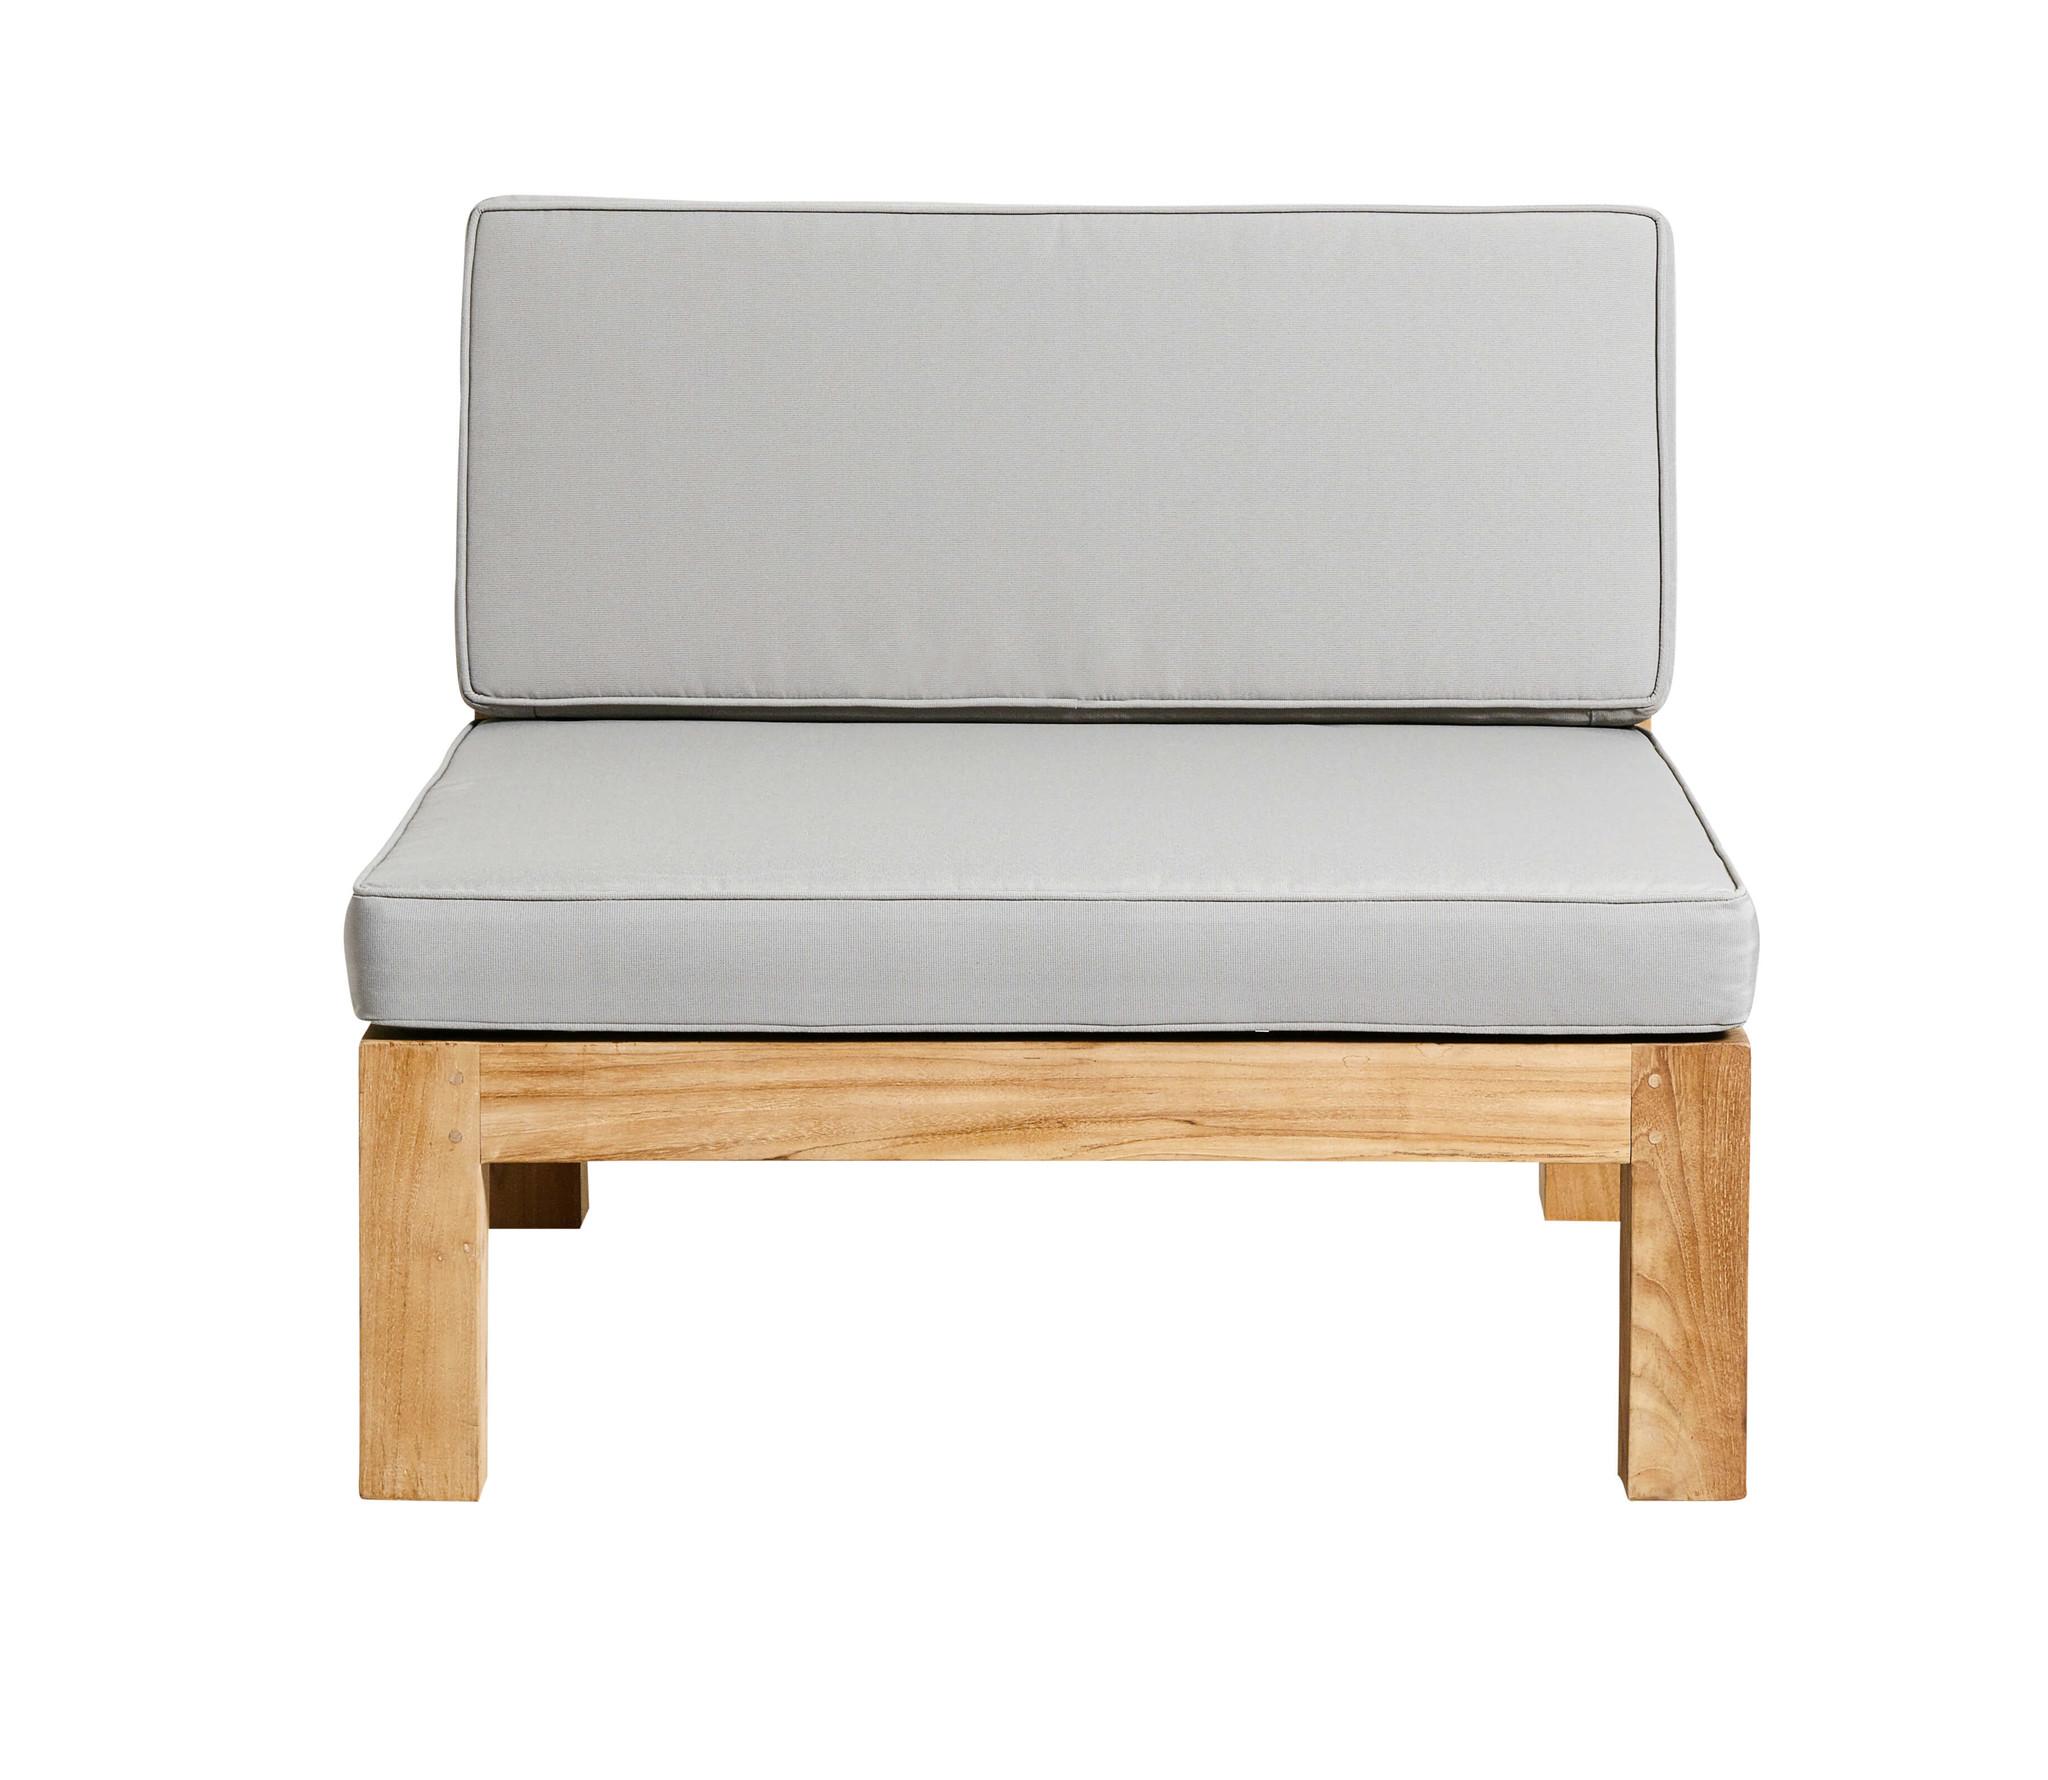 Design Stoel Lounge.Lounge Stoel Mykonos 89 Wilhelmina Designs